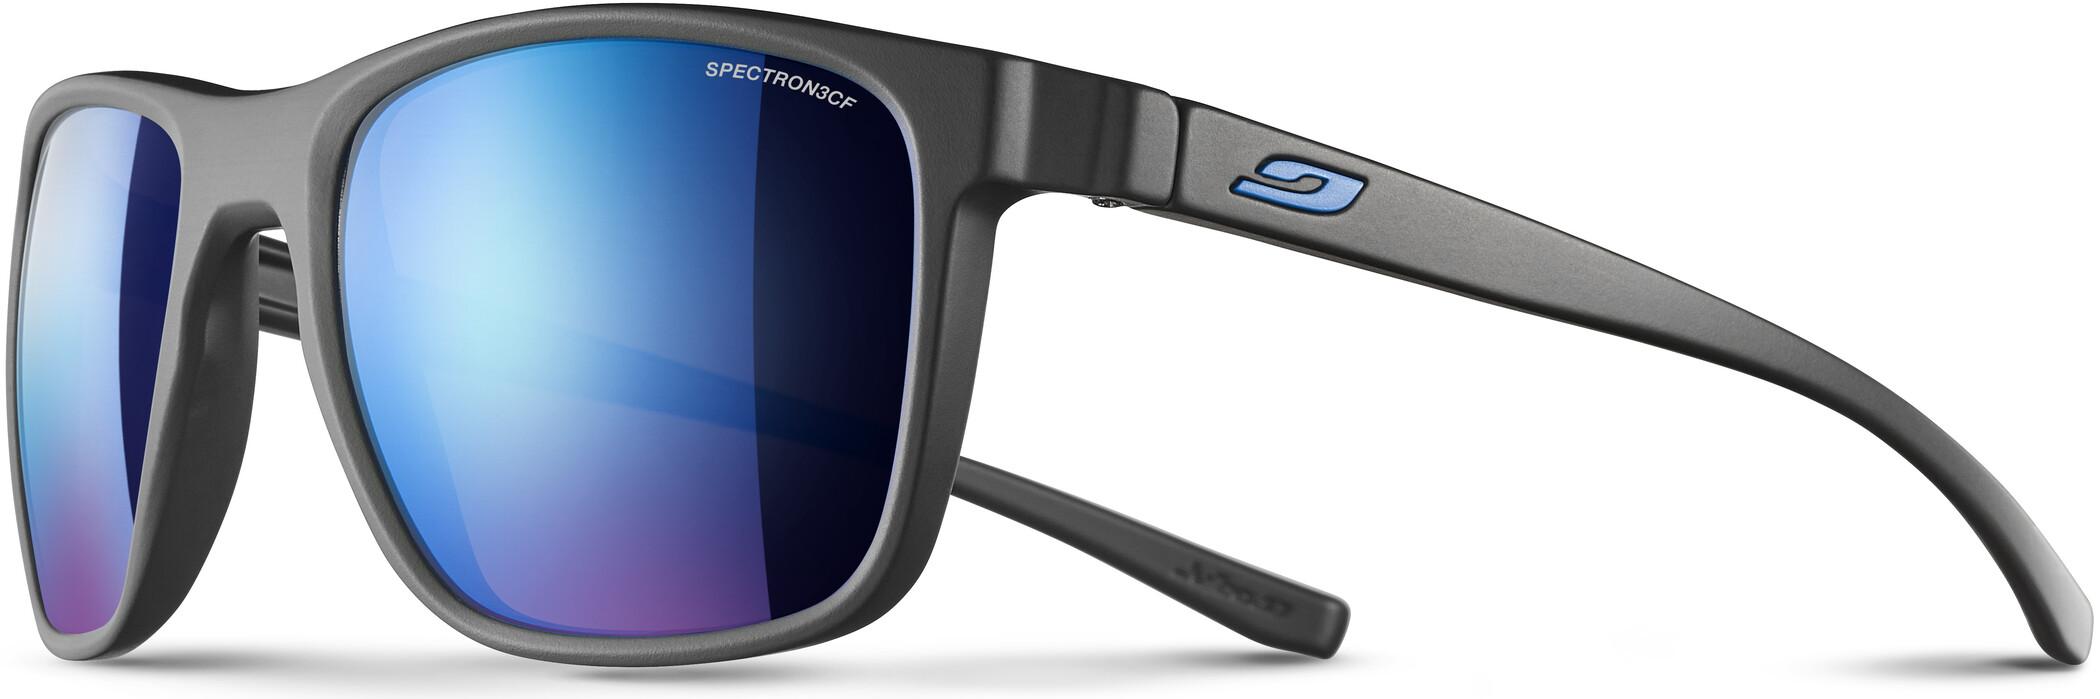 Julbo Trip Spectron 3CF Solbriller Herrer, army (2020) | Glasses